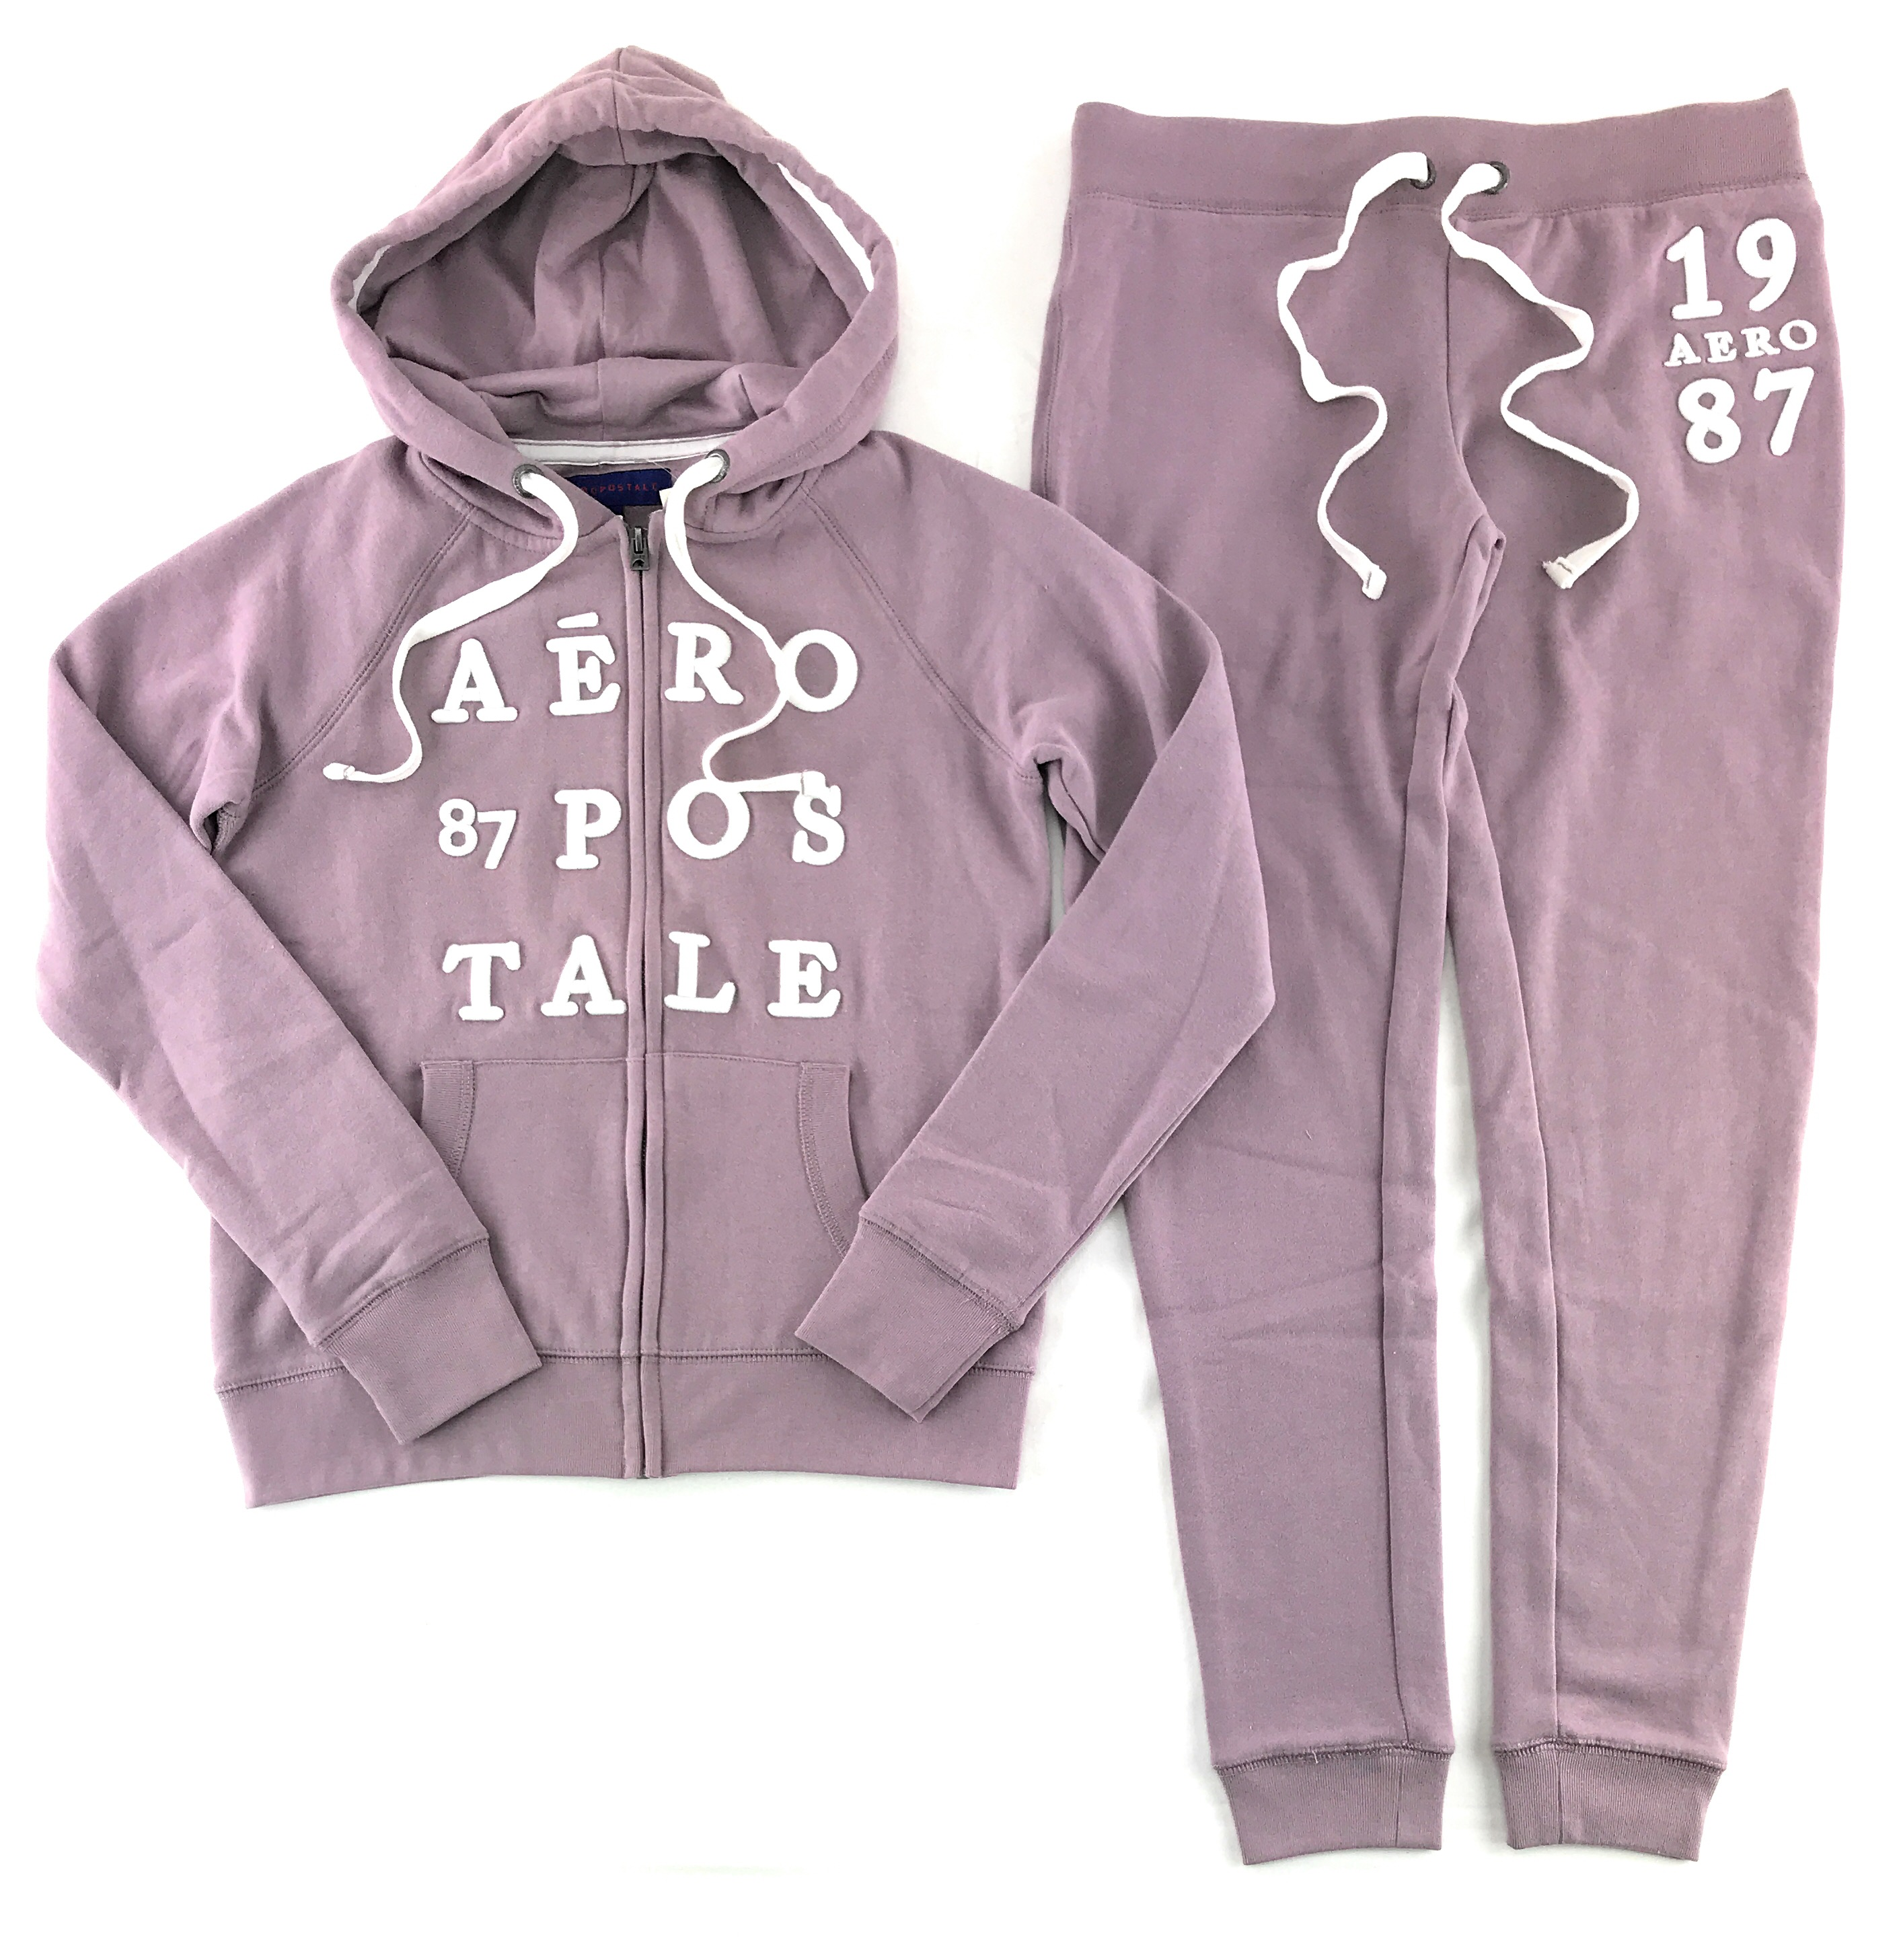 AERO AEROPOSTALE HOODIE Sweatshirt  SWEAT PANTS Track SUIT Sweatsuit M,L,XL,2XL